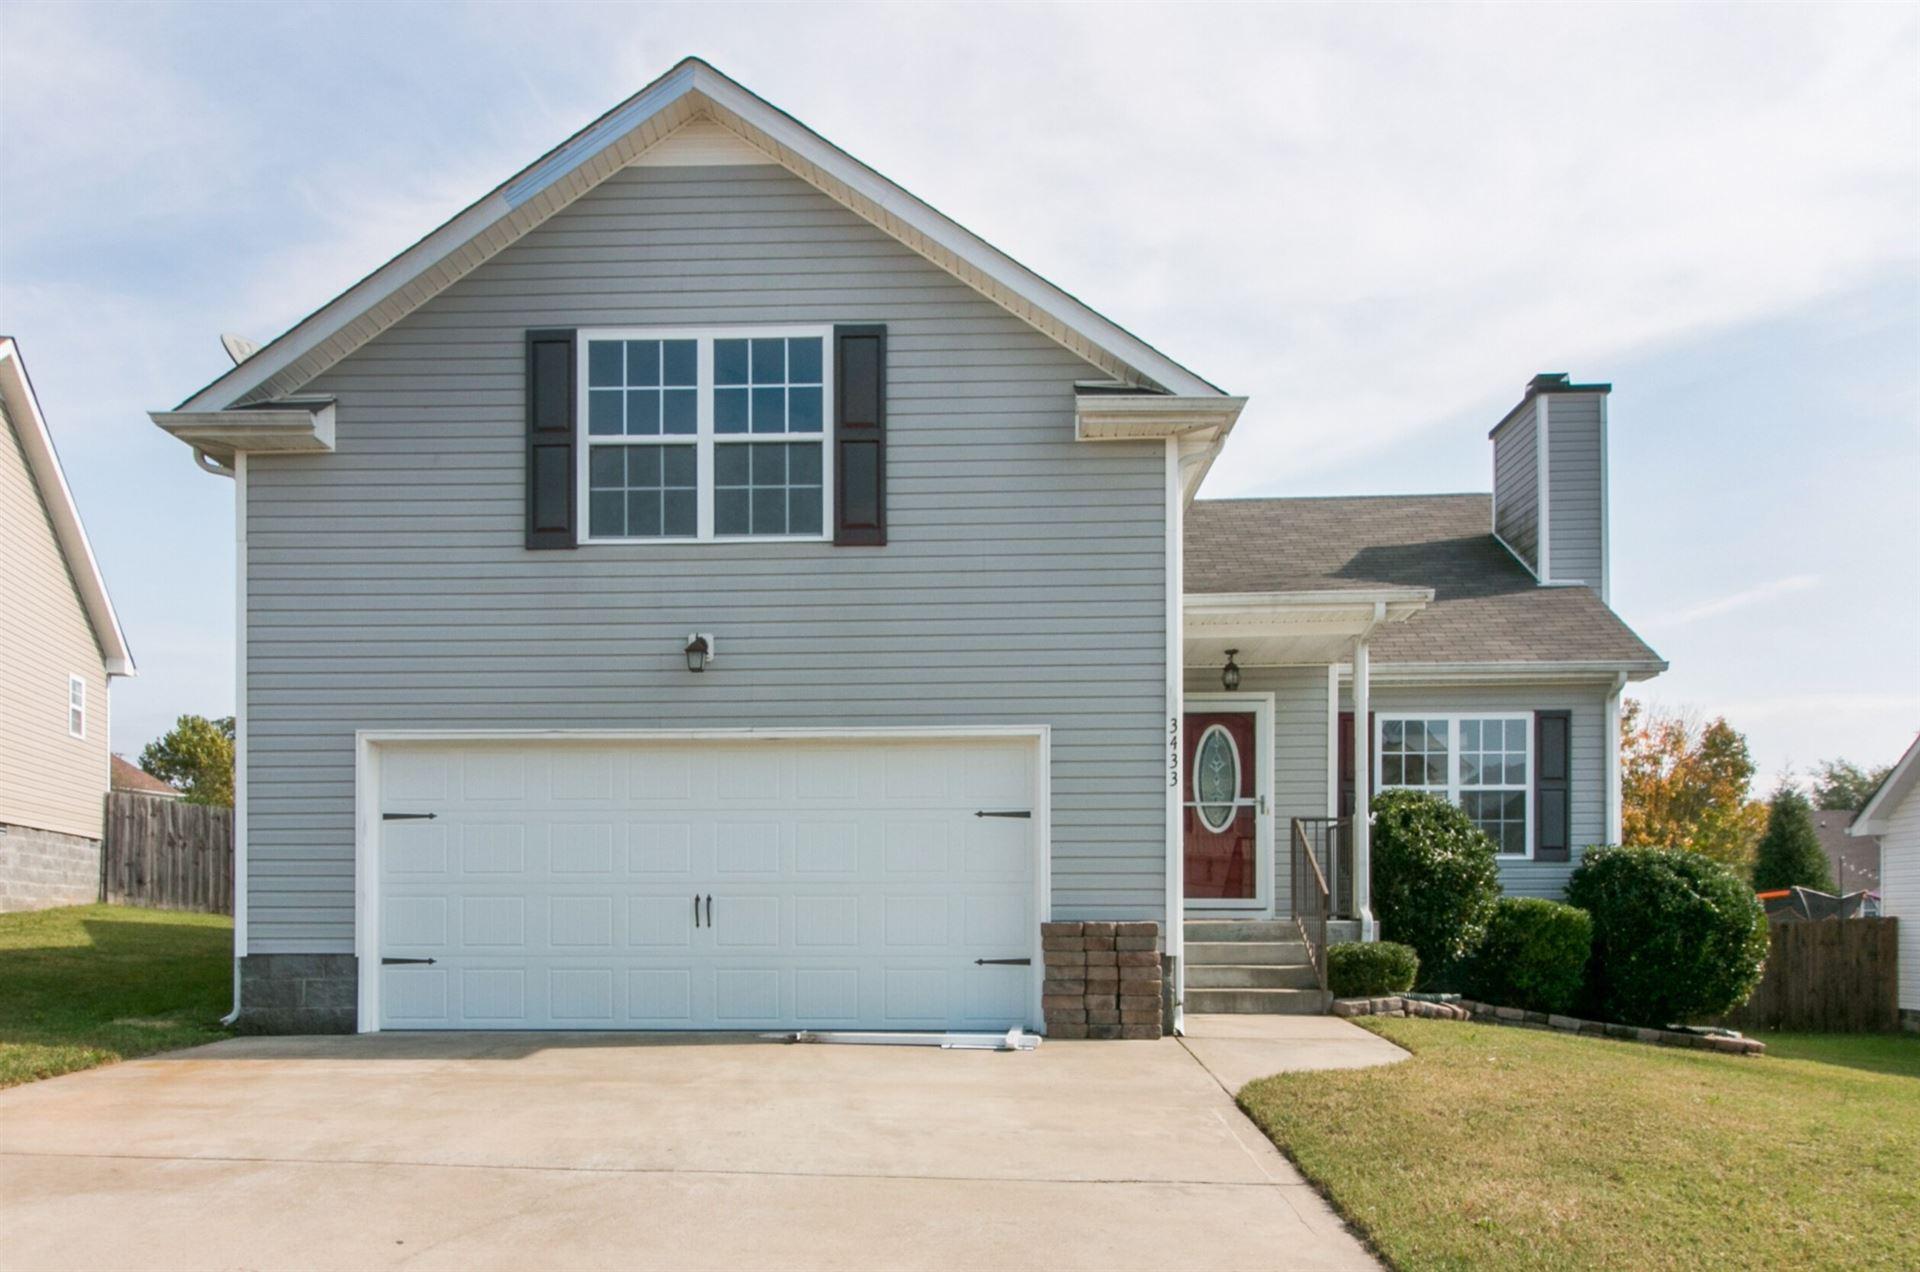 3433 Oconnor Ln, Clarksville, TN 37042 - MLS#: 2201185